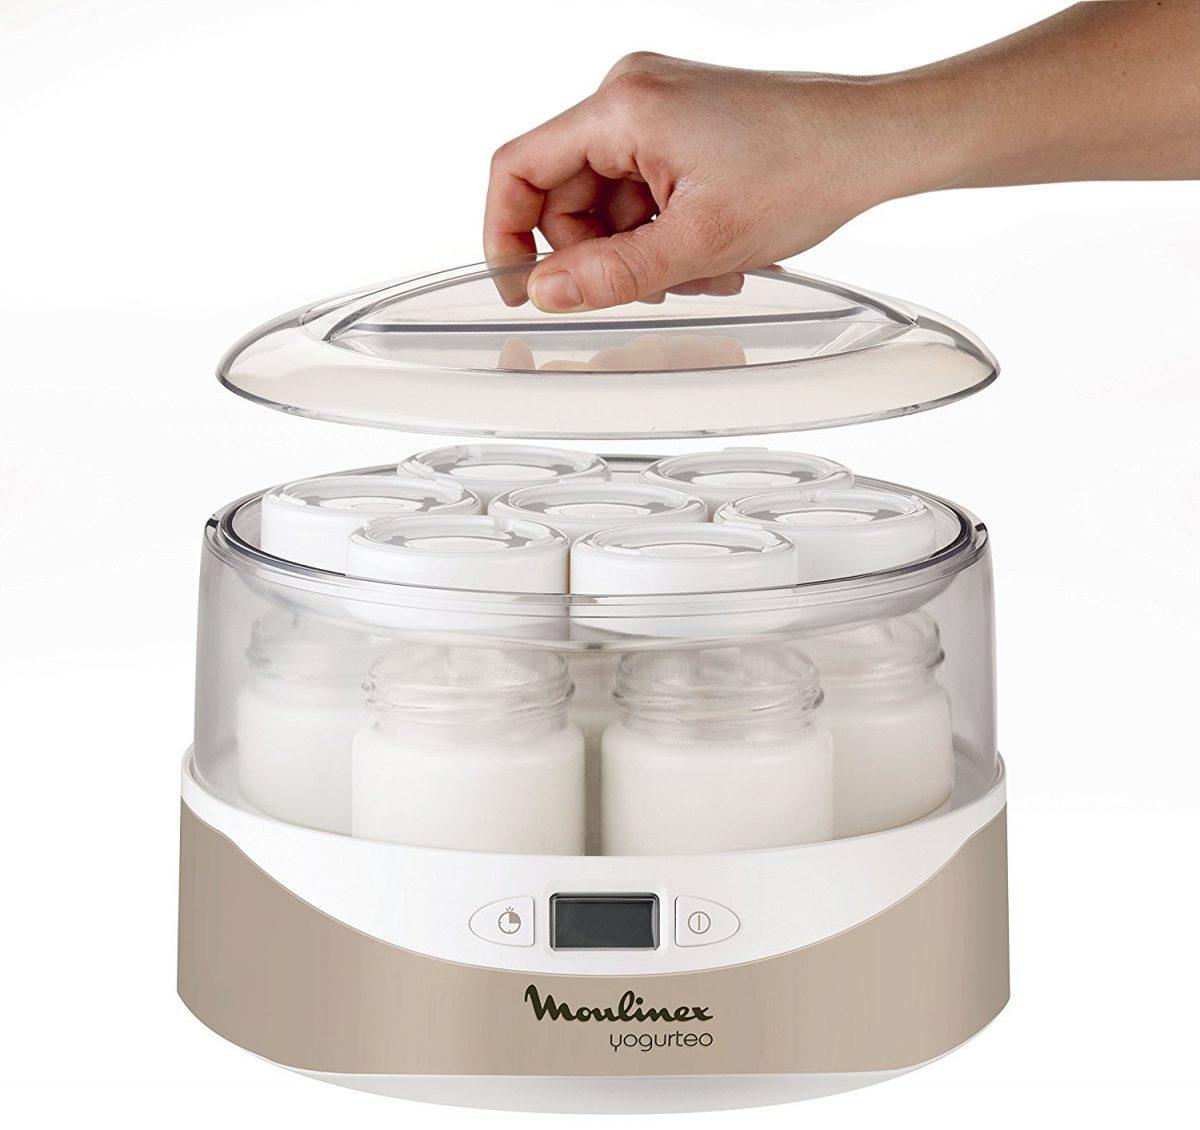 moulinex-yogurtiera